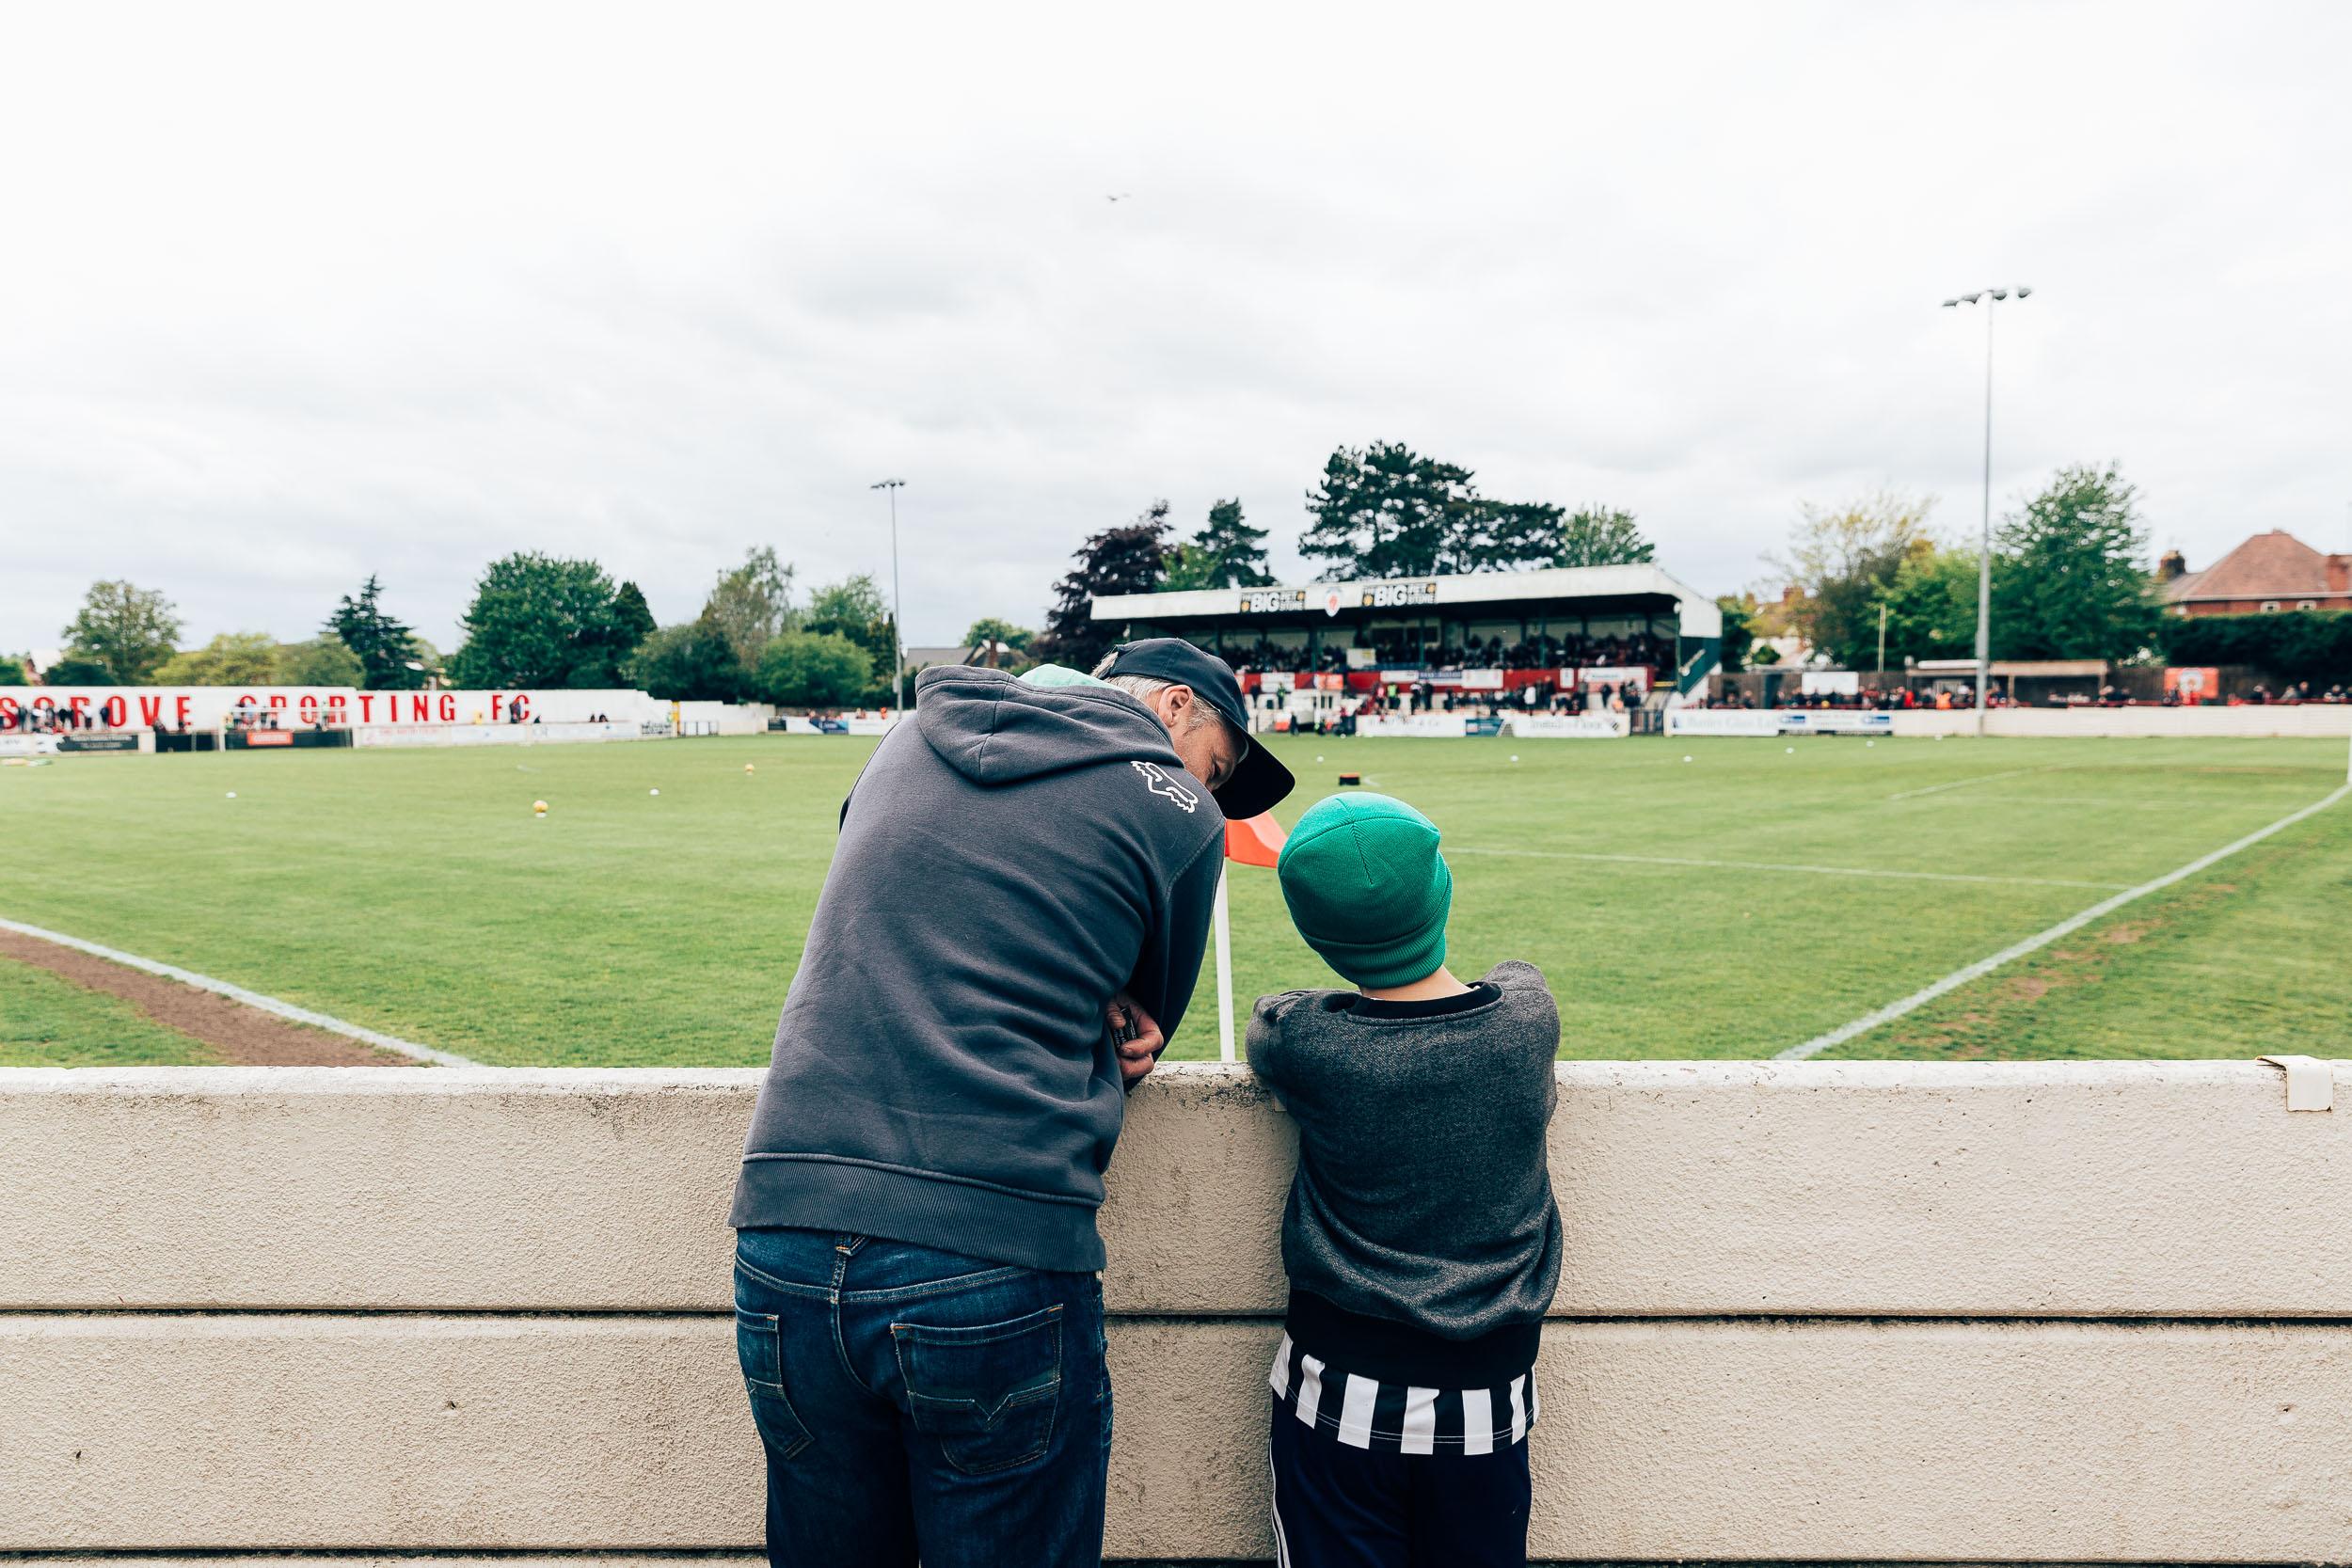 06_05_2019_Bromsgrove_Sporting_Corby-18.jpg